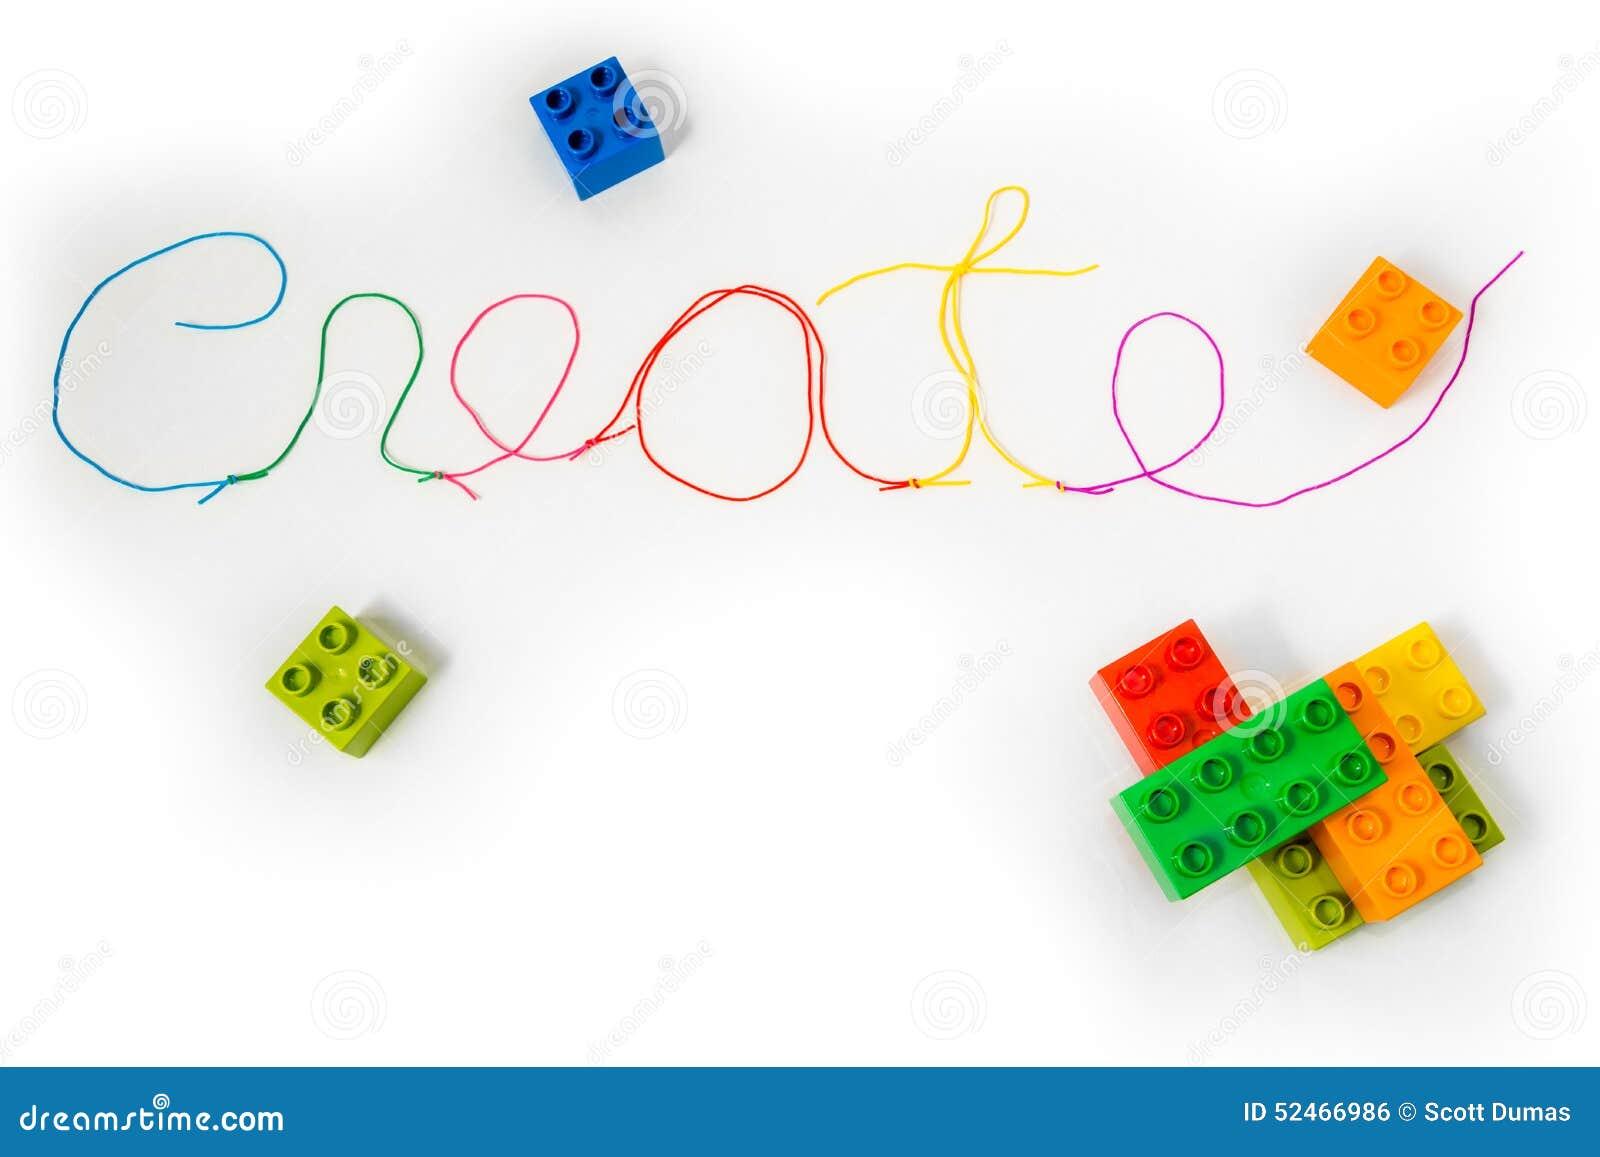 Stocks Download Shivam Creation: Create Stock Photo. Image Of Conceptual, Create, Word